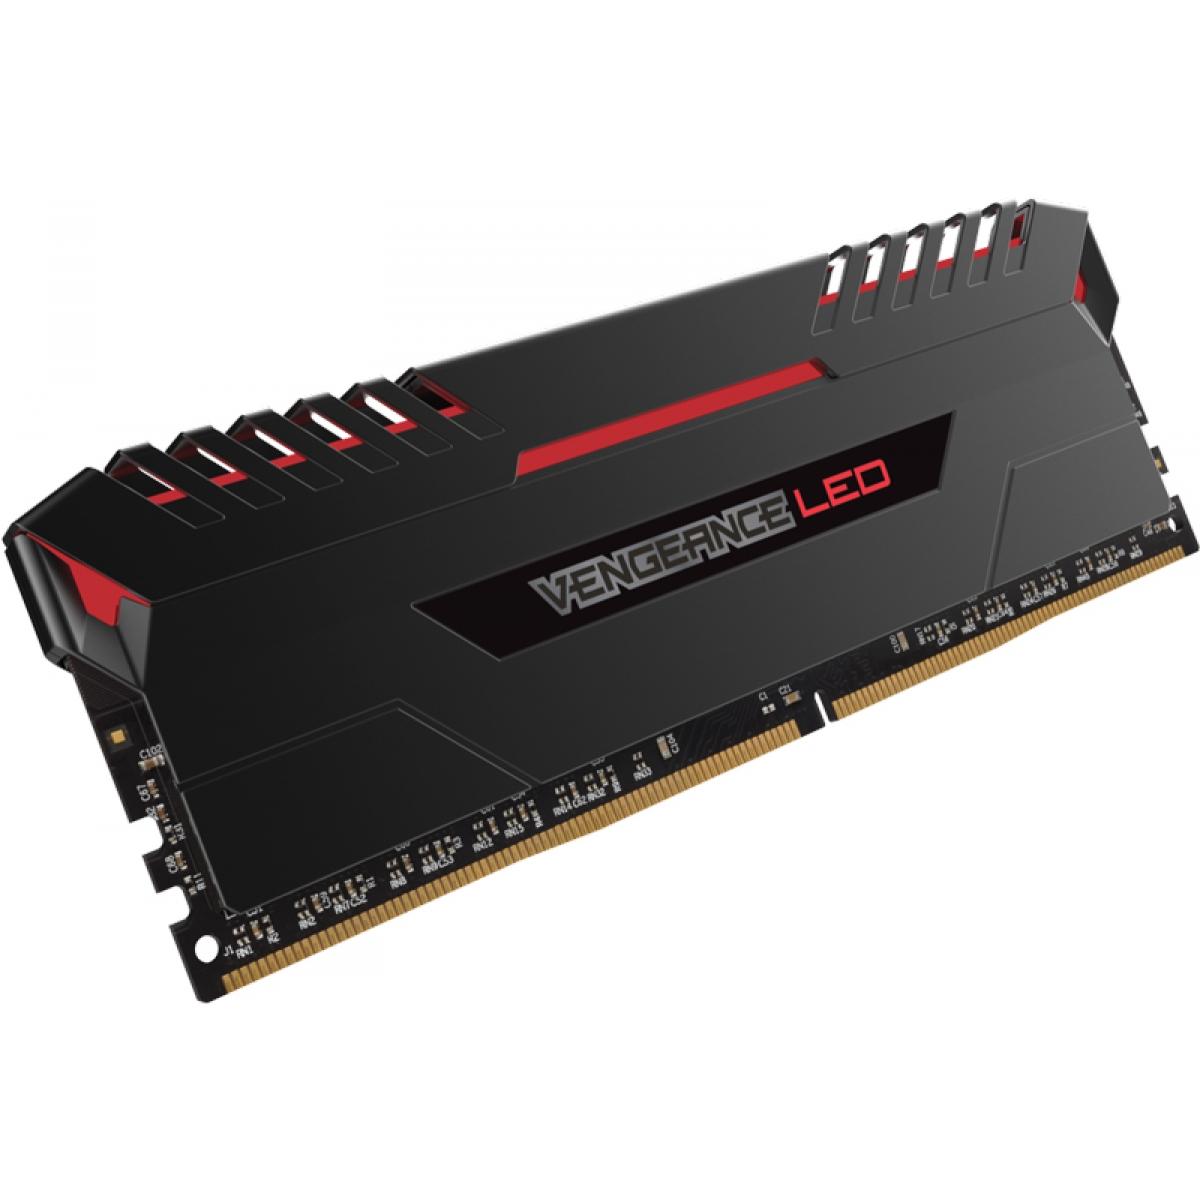 Memória DDR4 Corsair Vengeance LED 16GB (2x8GB) 2666MHz CMU16GX4M2A2666C16R